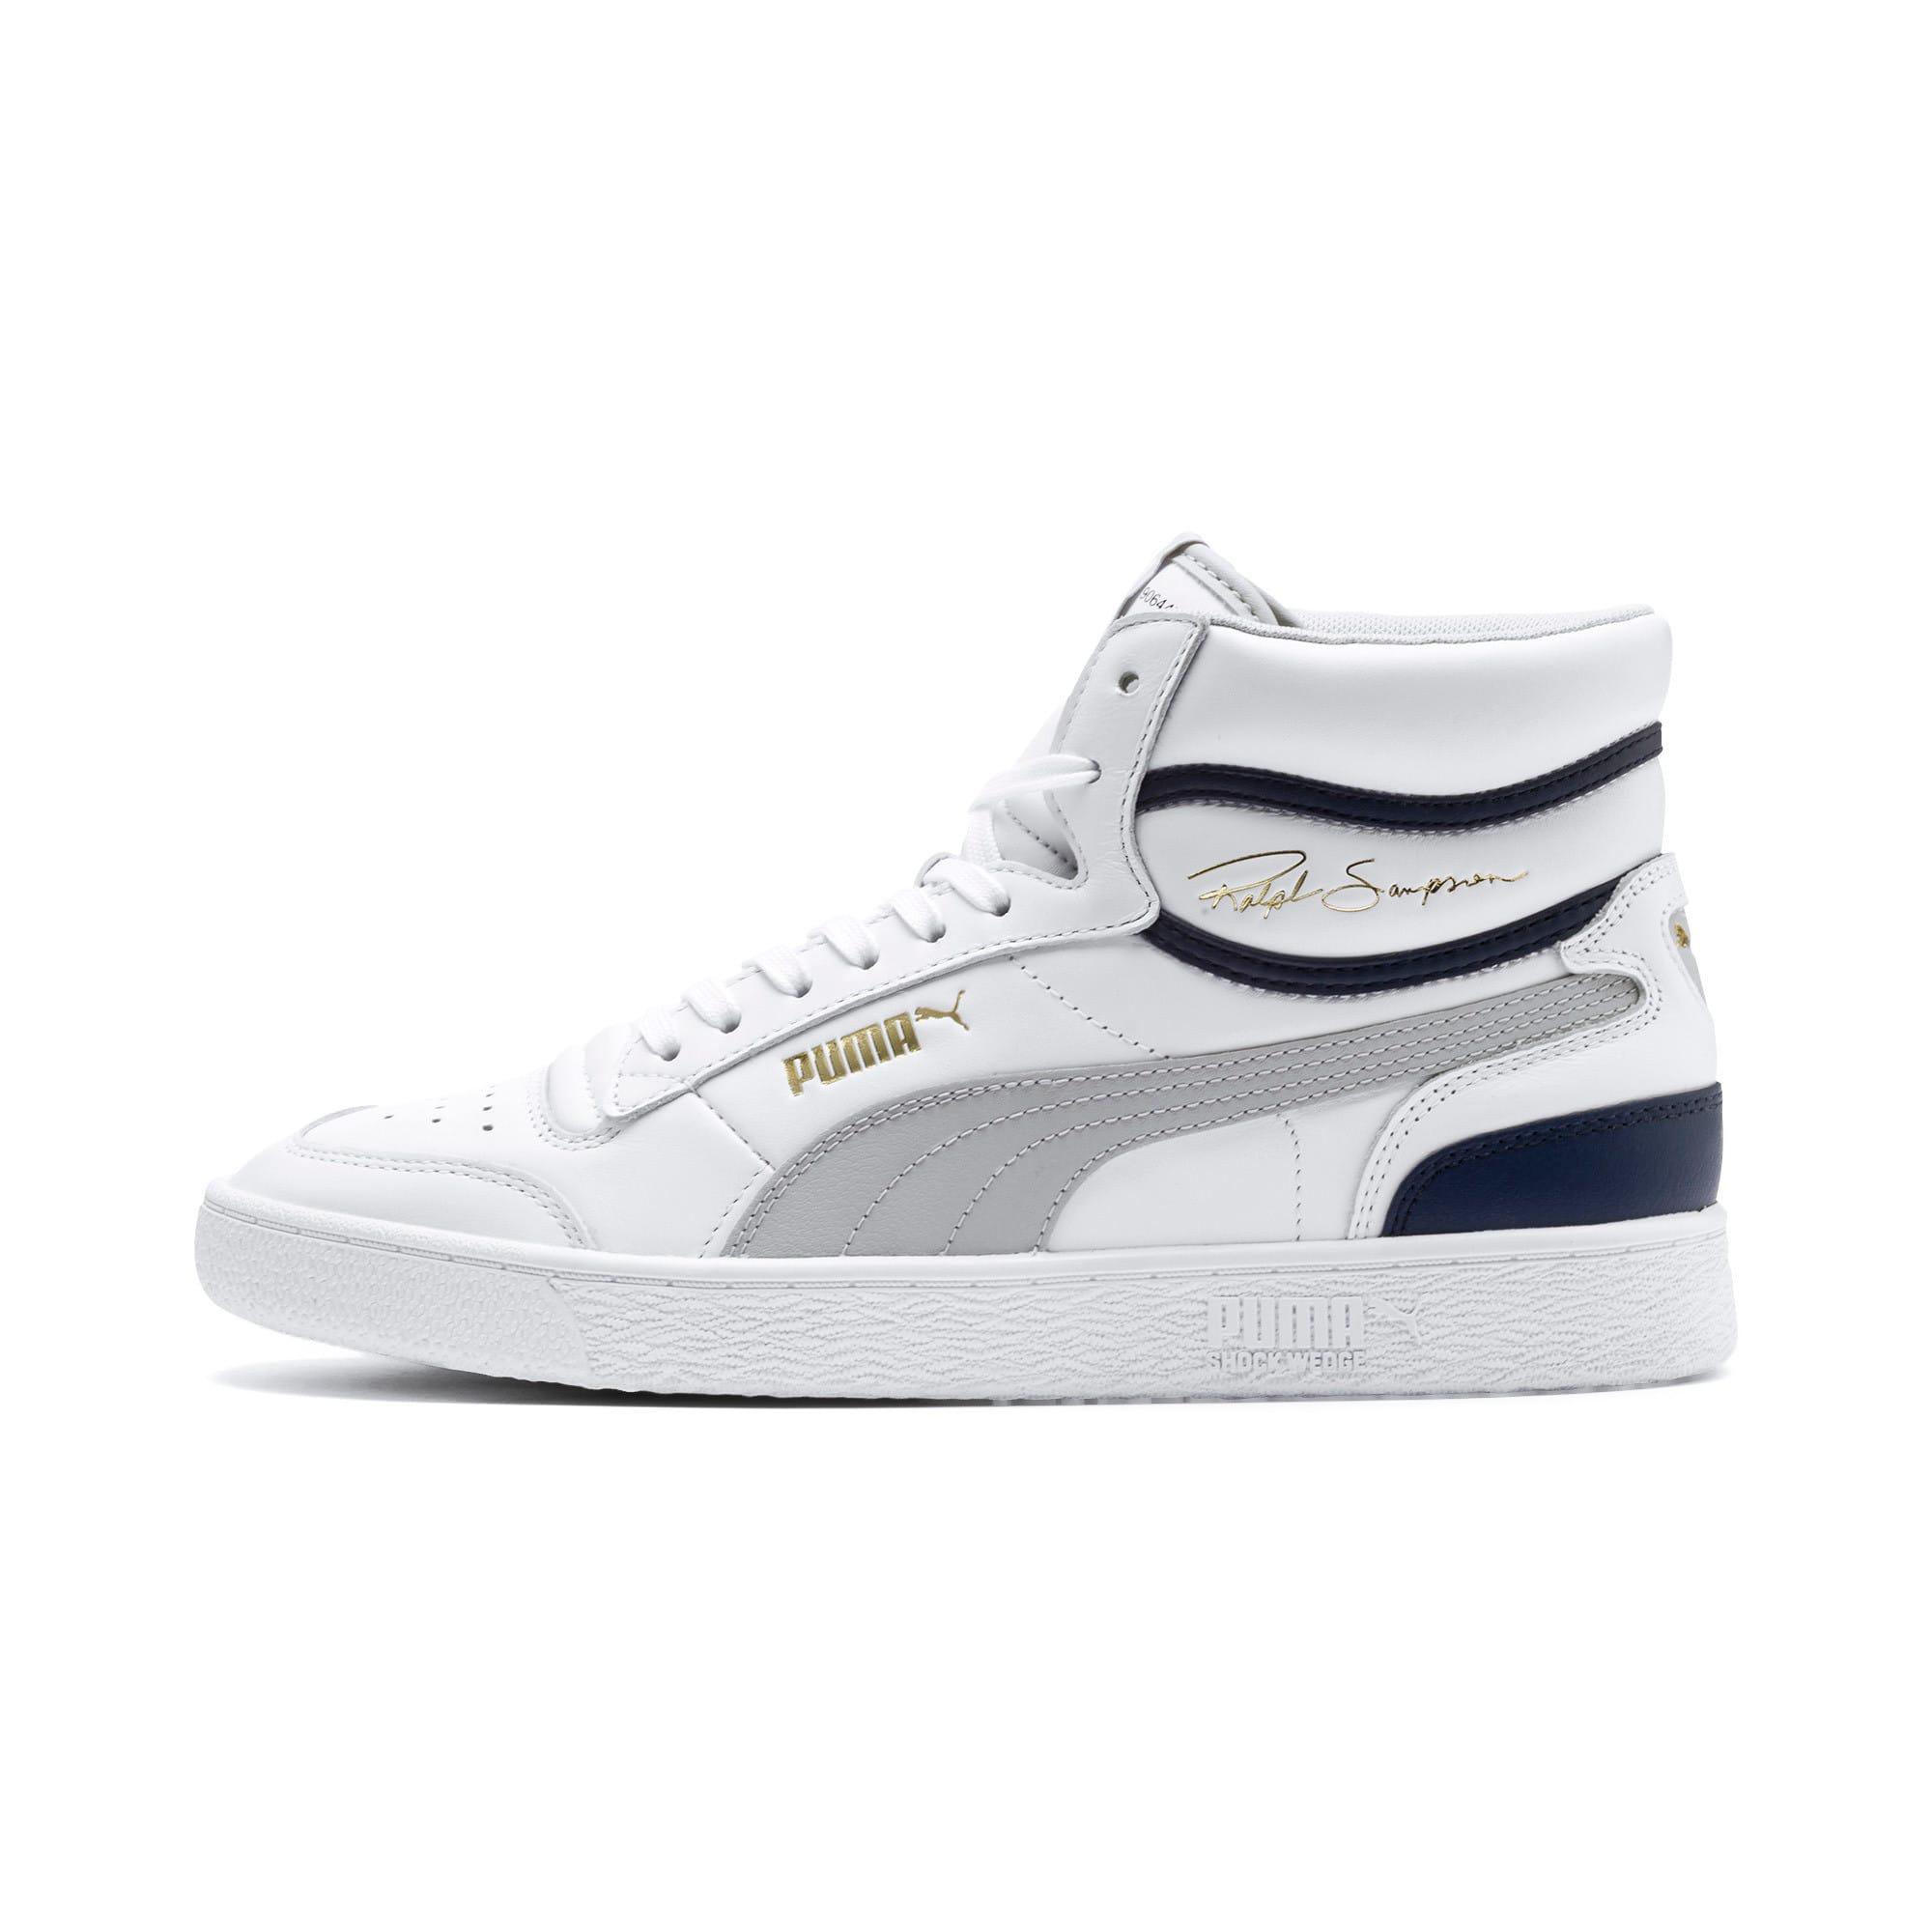 Thumbnail 1 of Ralph Sampson Mid Sneakers, P White-Gray Violet-Peacoat, medium